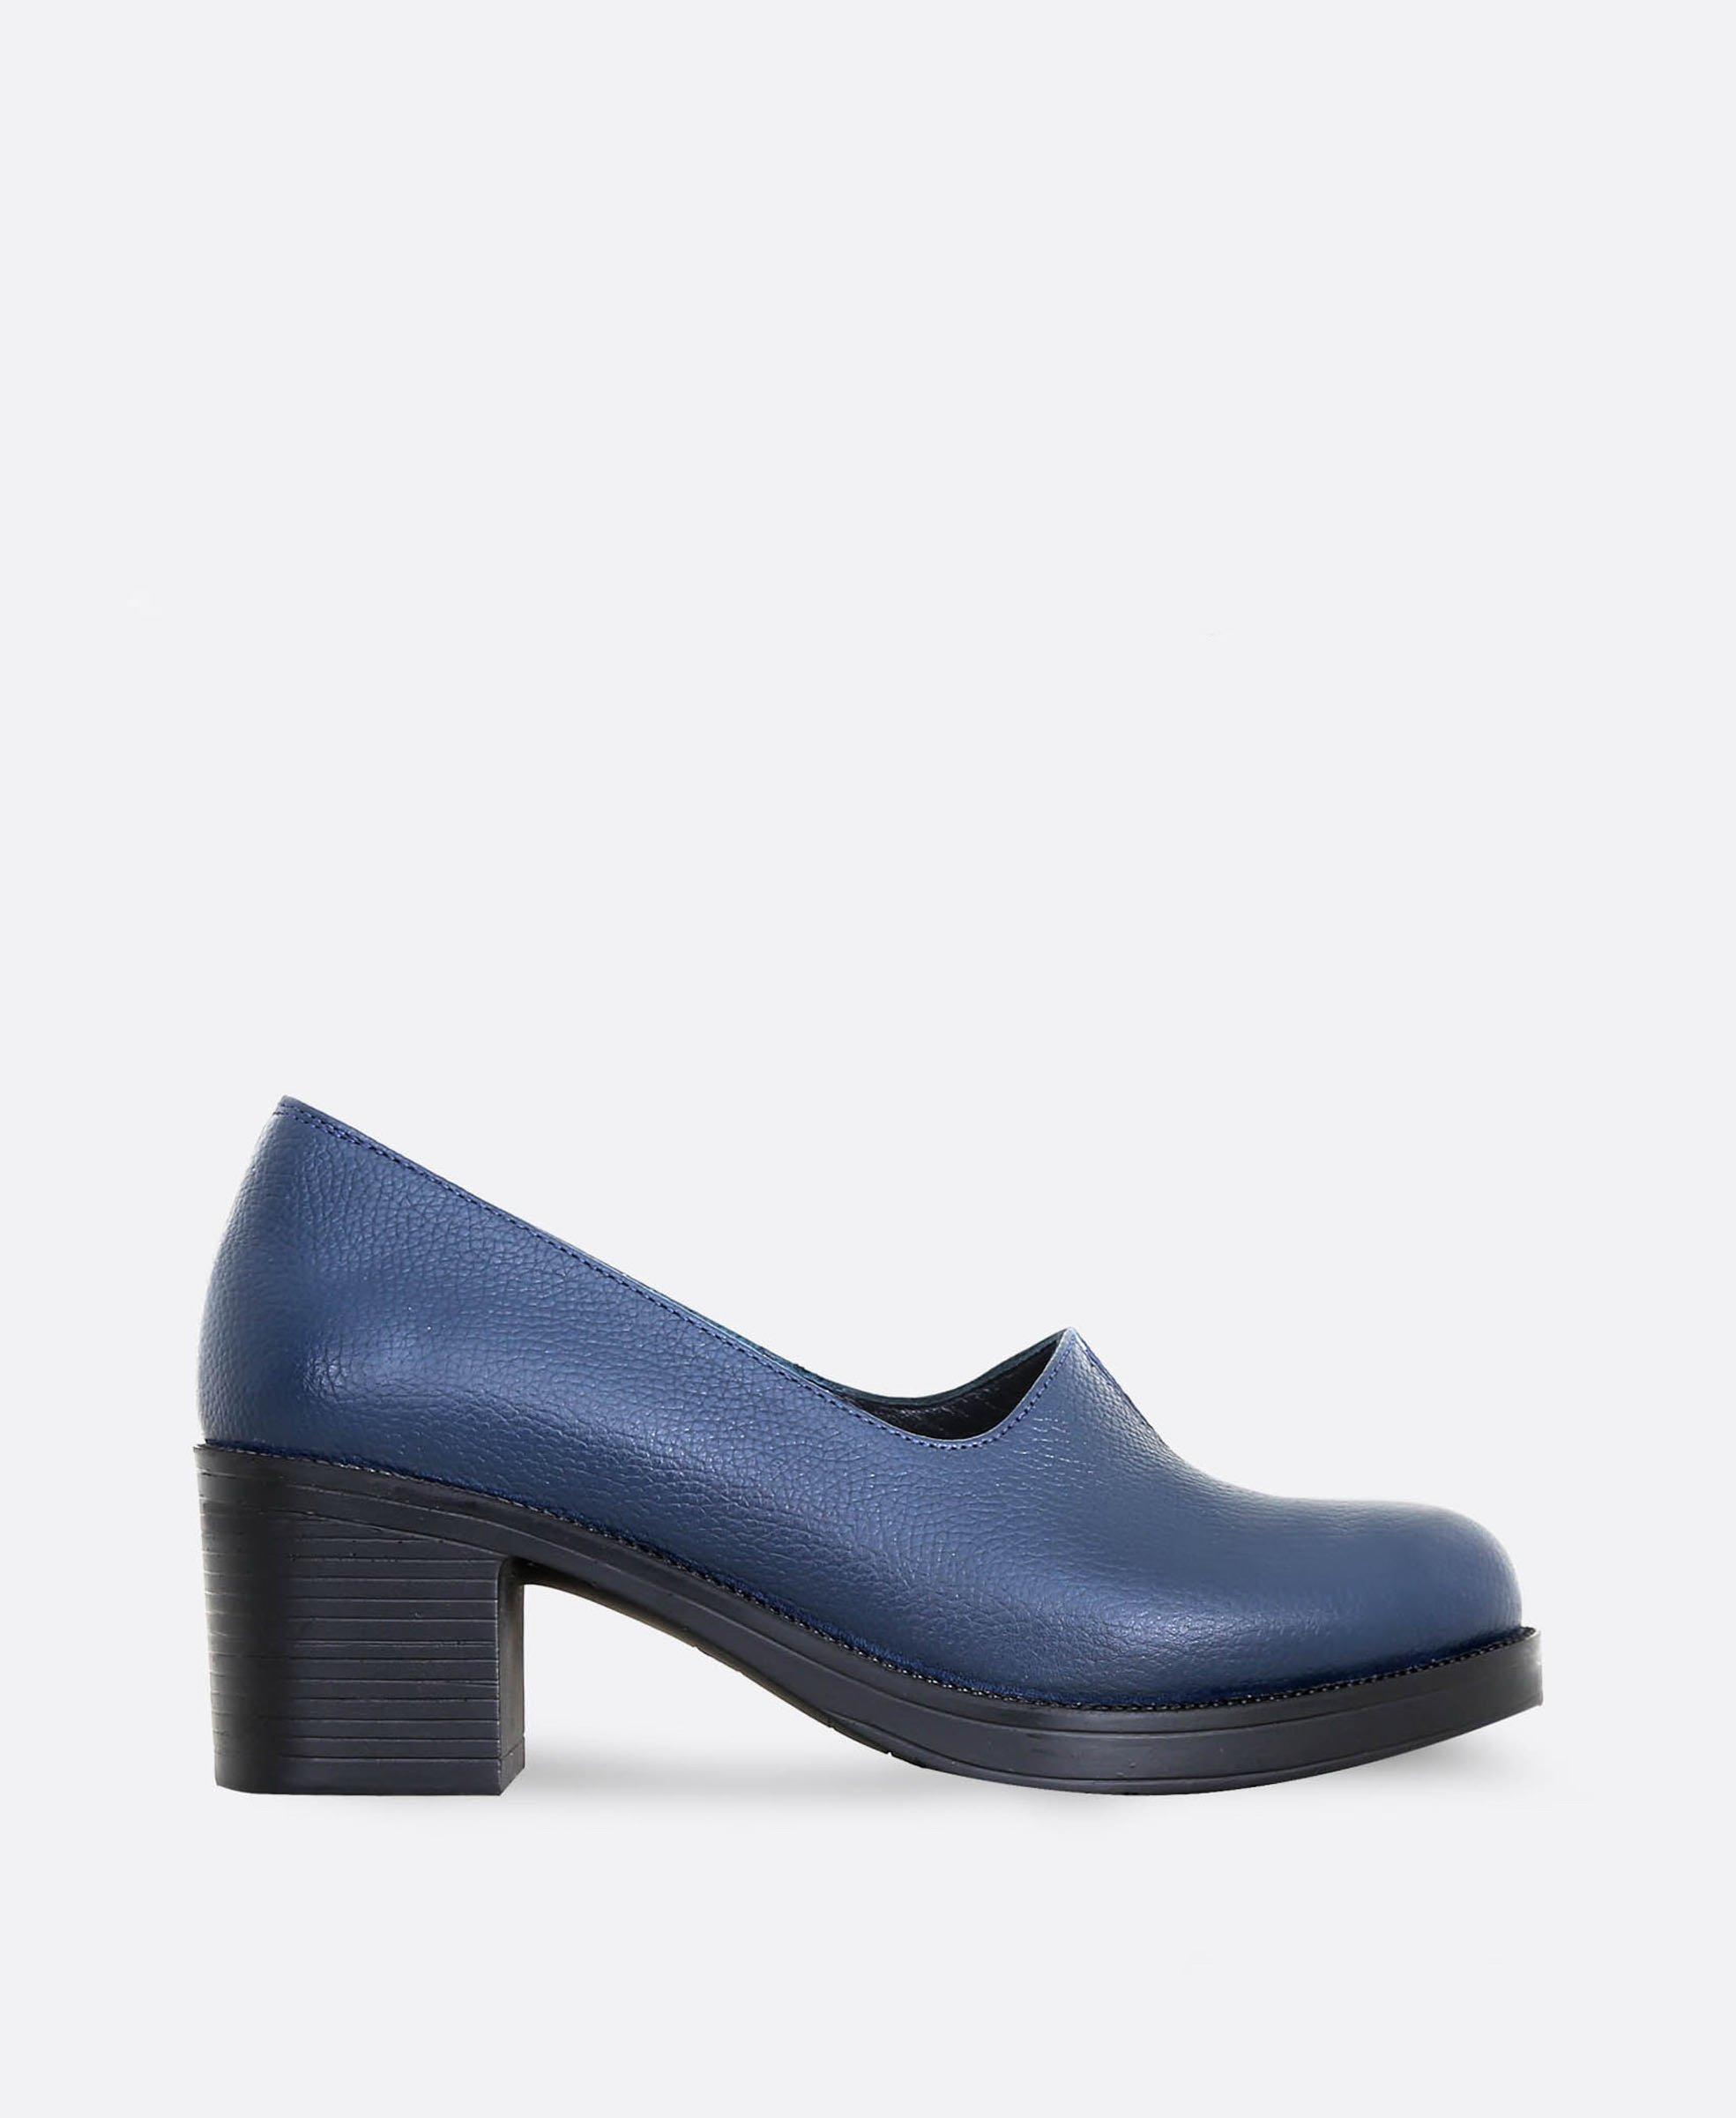 کفش زنانه چرم 0341